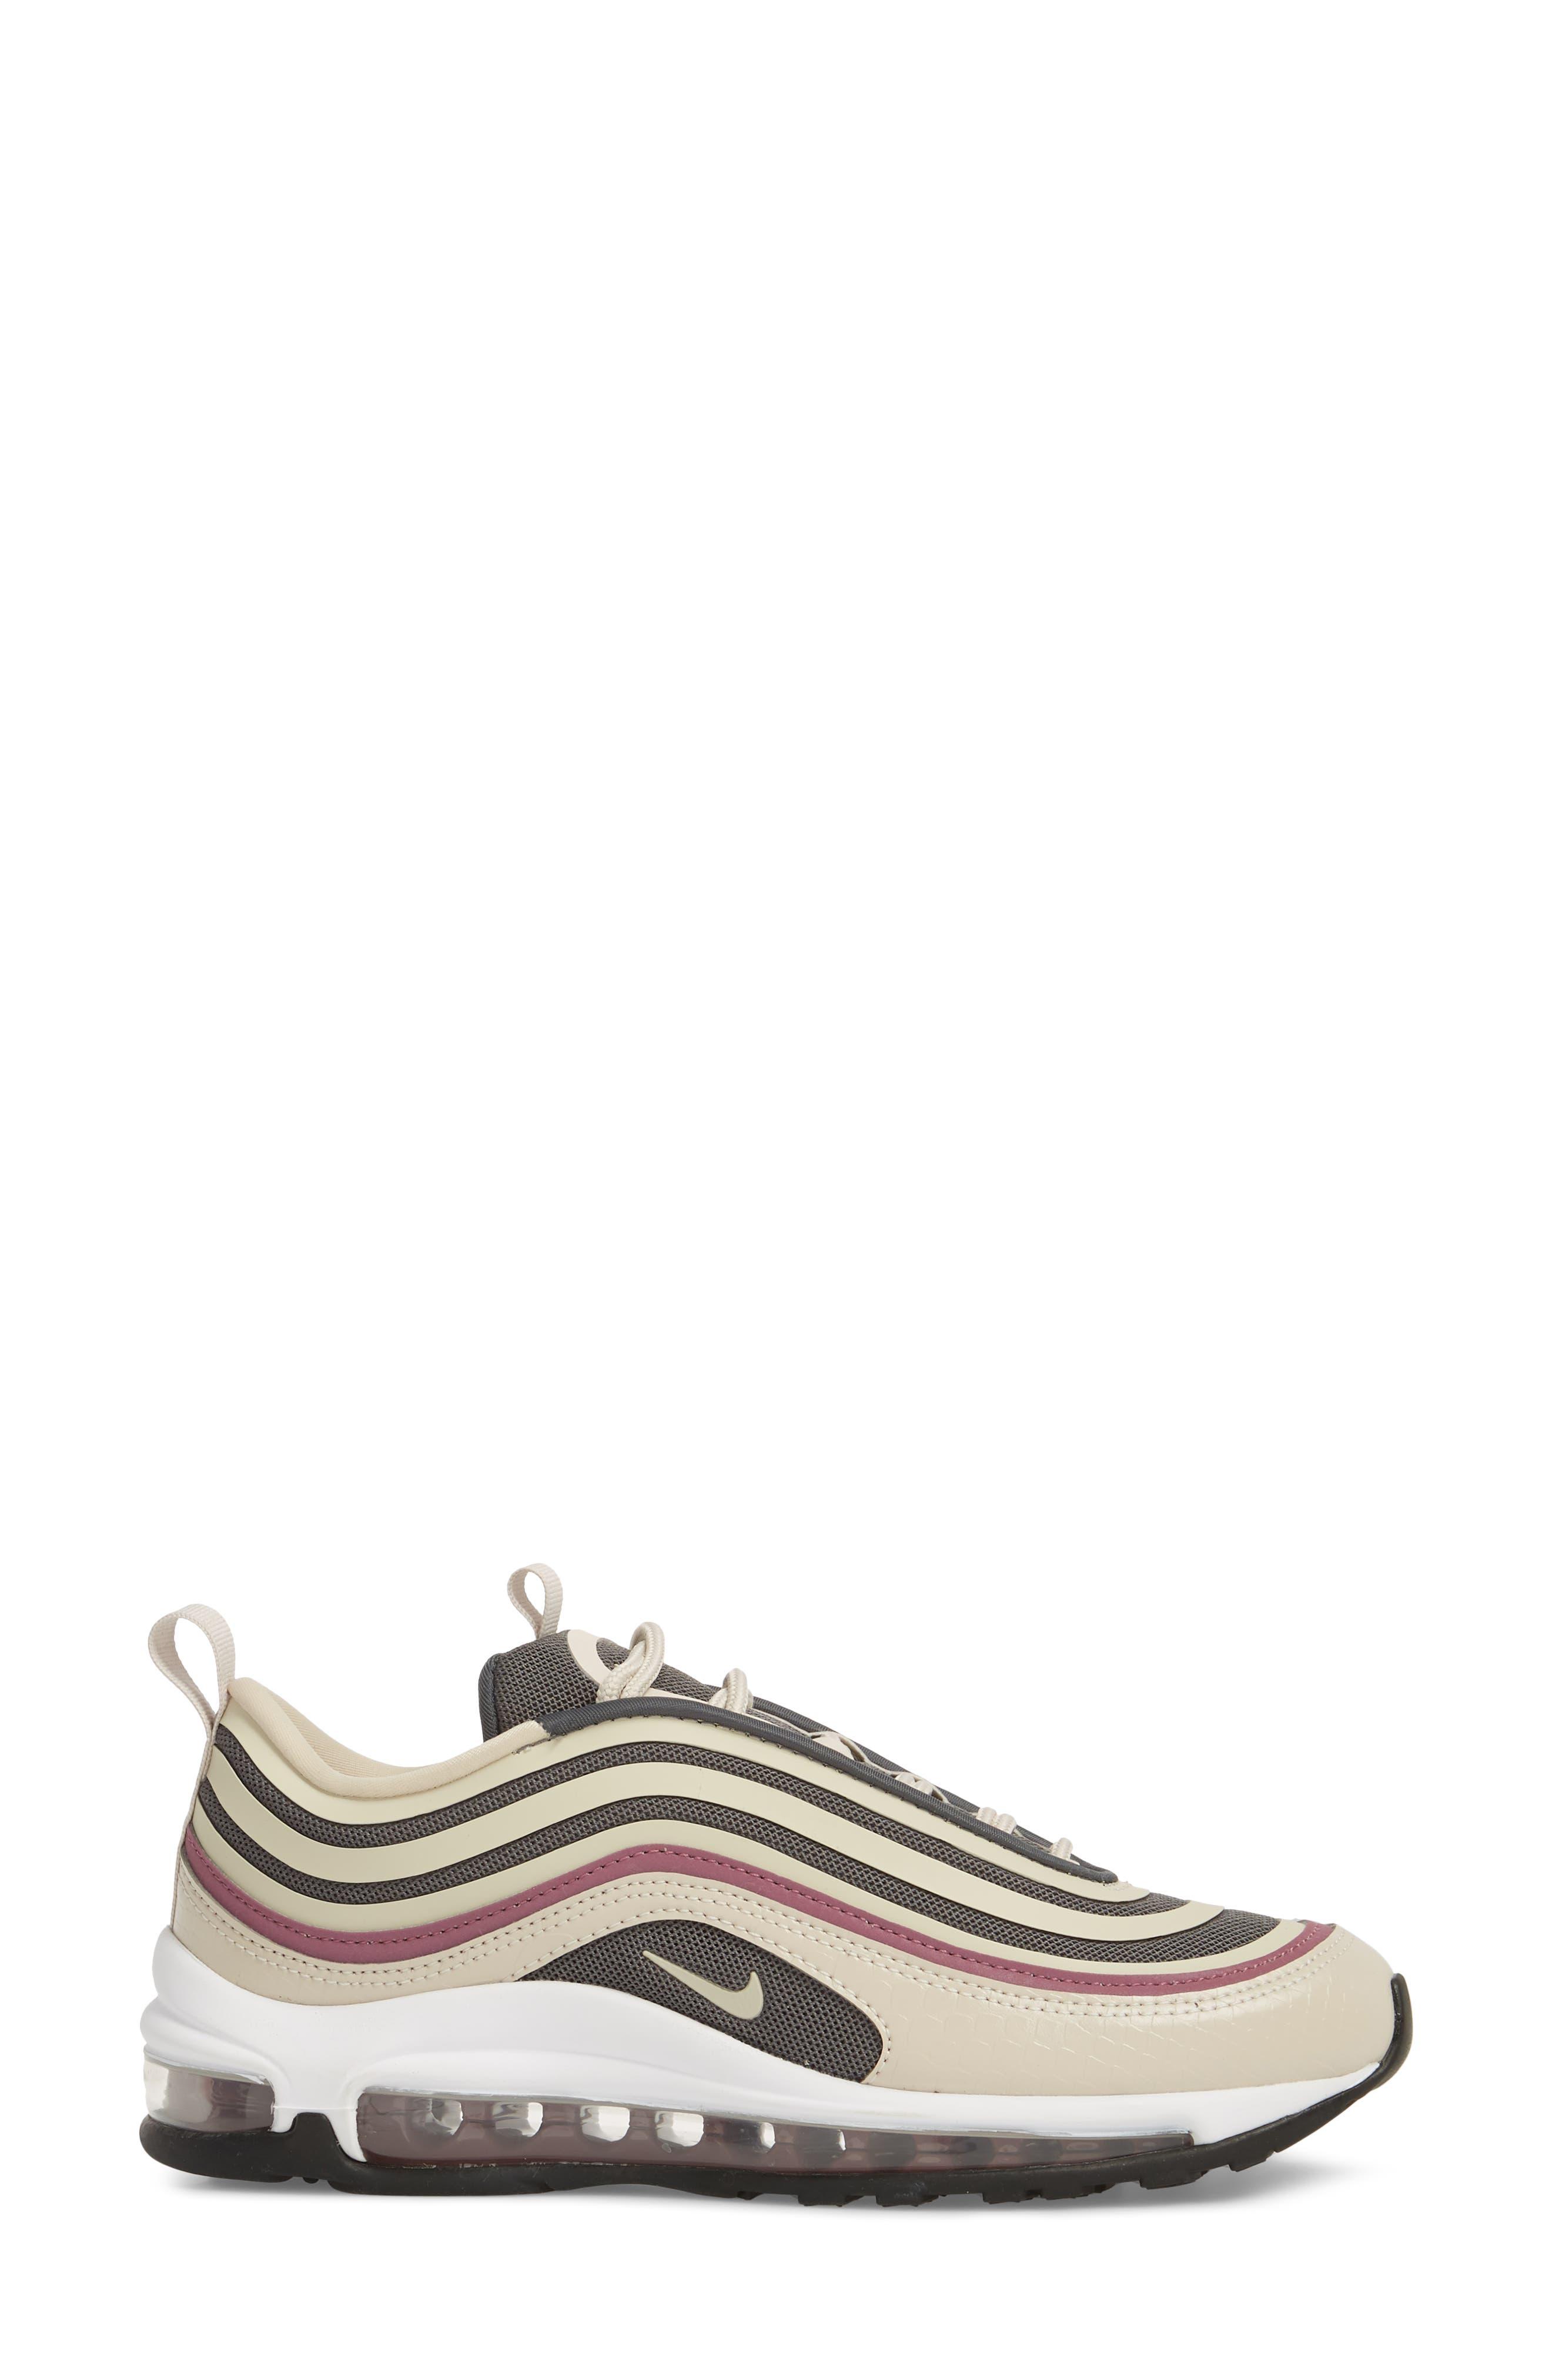 Air Max 97 Ultra '17 SE Sneaker,                             Alternate thumbnail 20, color,